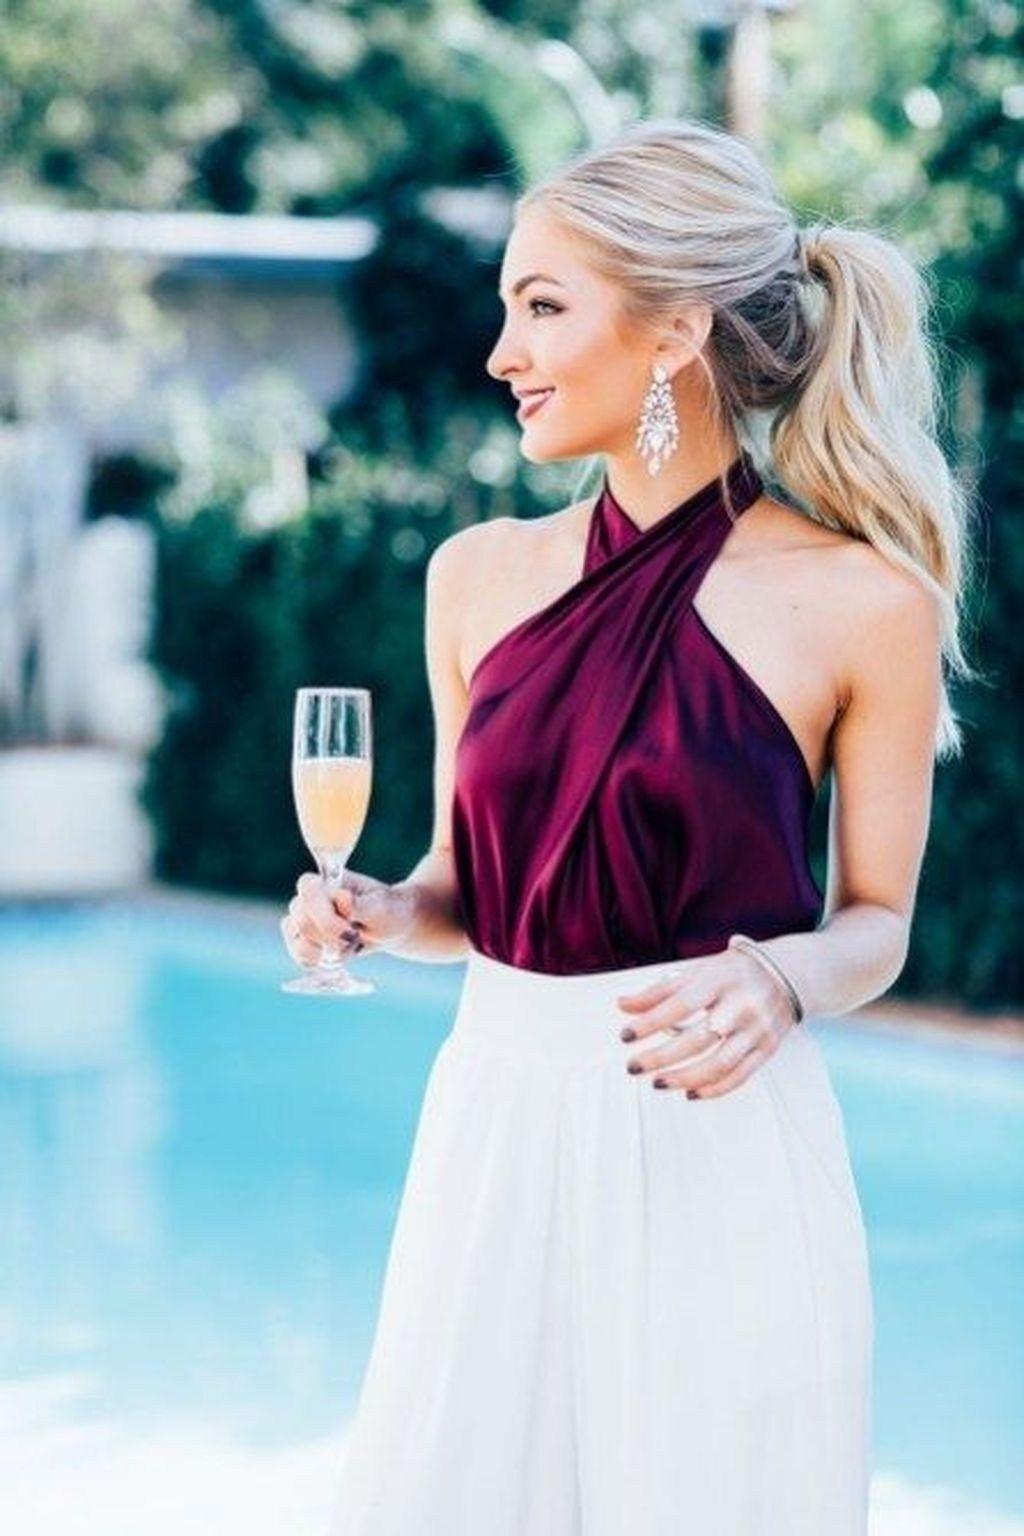 Going To A Destination Wedding Soon Tropical Weddings Are Very Different Than Traditional Wedding Attire Guest Wedding Guest Dress Summer Wedding Guest Dress [ 1536 x 1024 Pixel ]